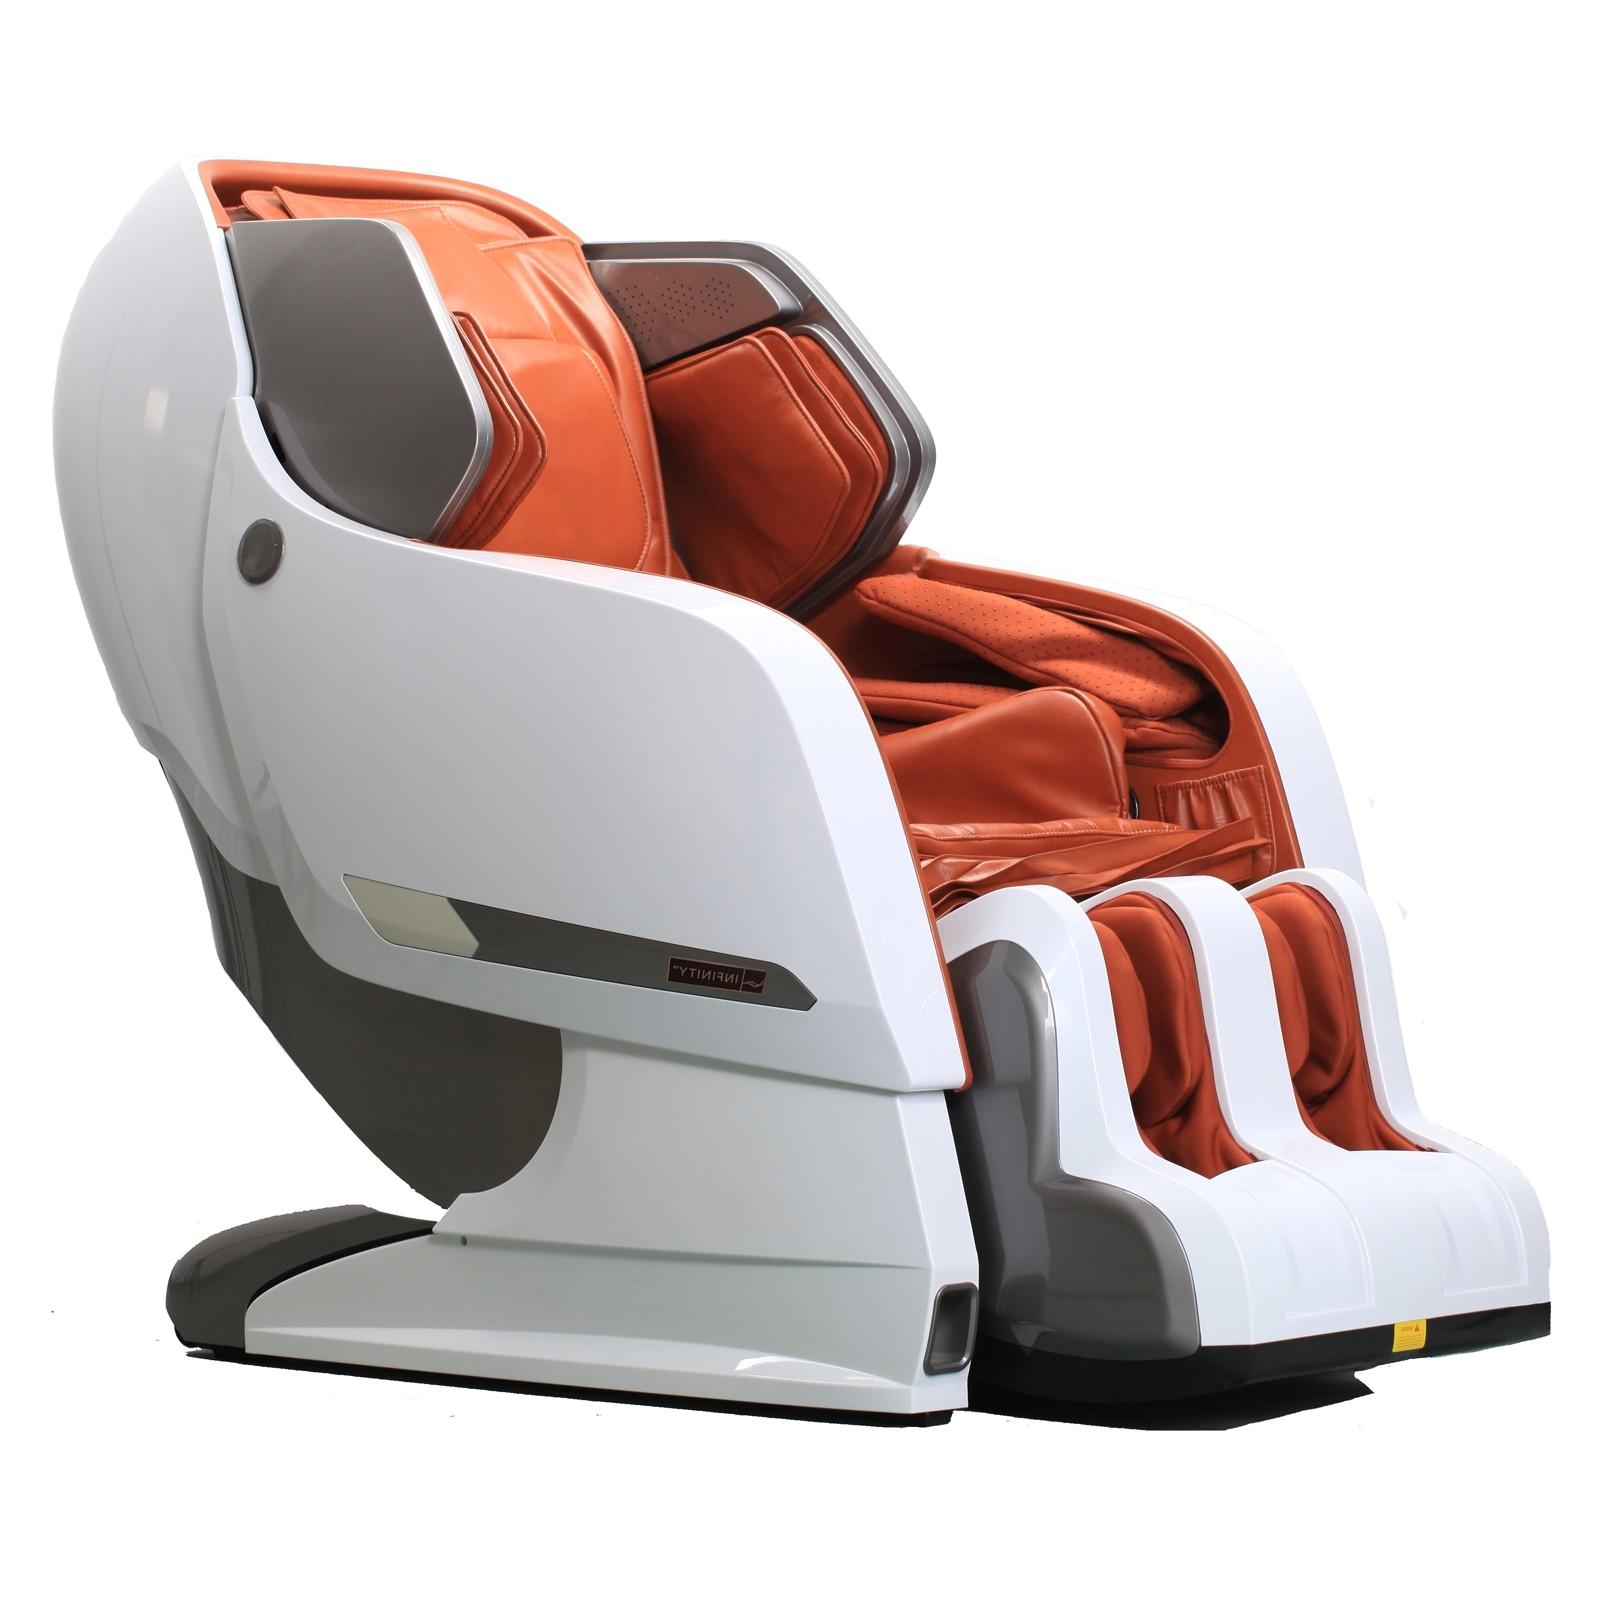 Infinity Iyashi Massage Chair Costco Chair Beautiful Massage Pad for Chair Walmart Brookstone Shiatsu